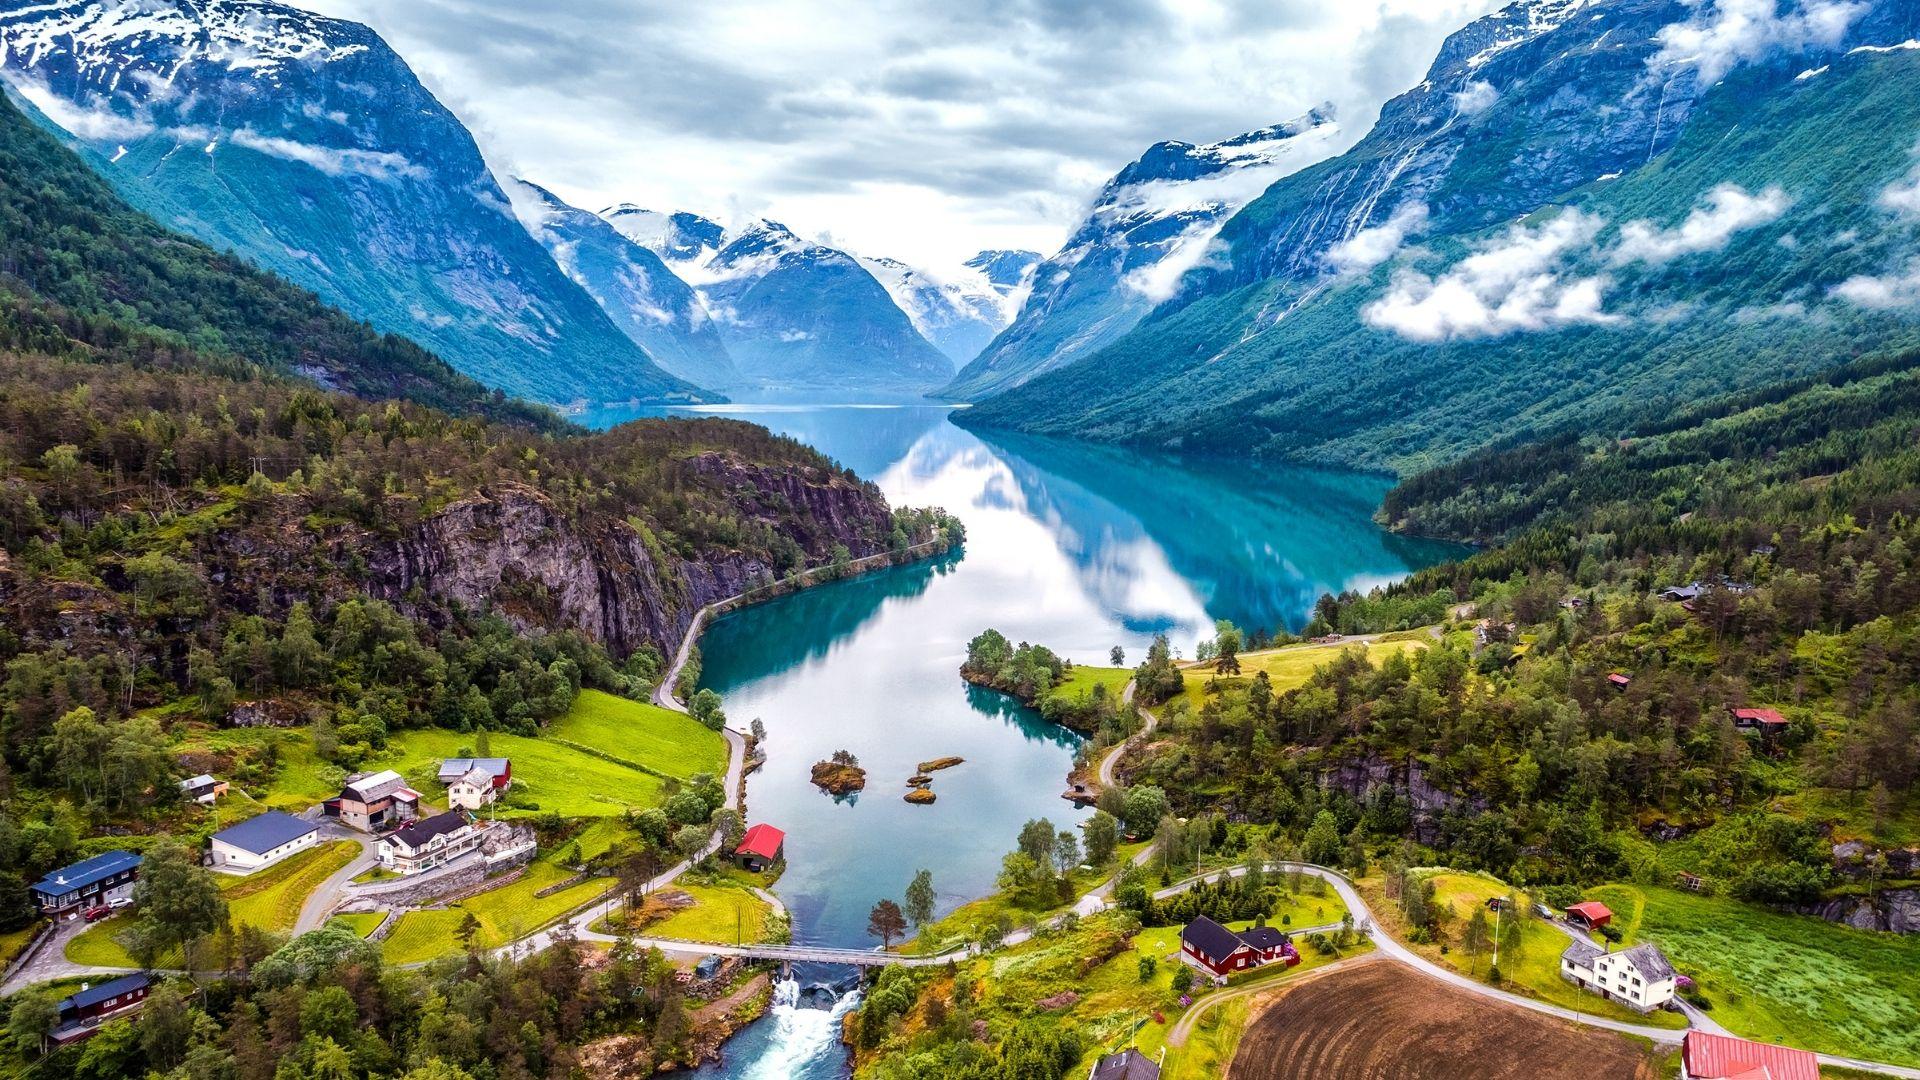 Norveç Vizesi: Randevu ve Başvuru (2021) 1 – norvec vize 2